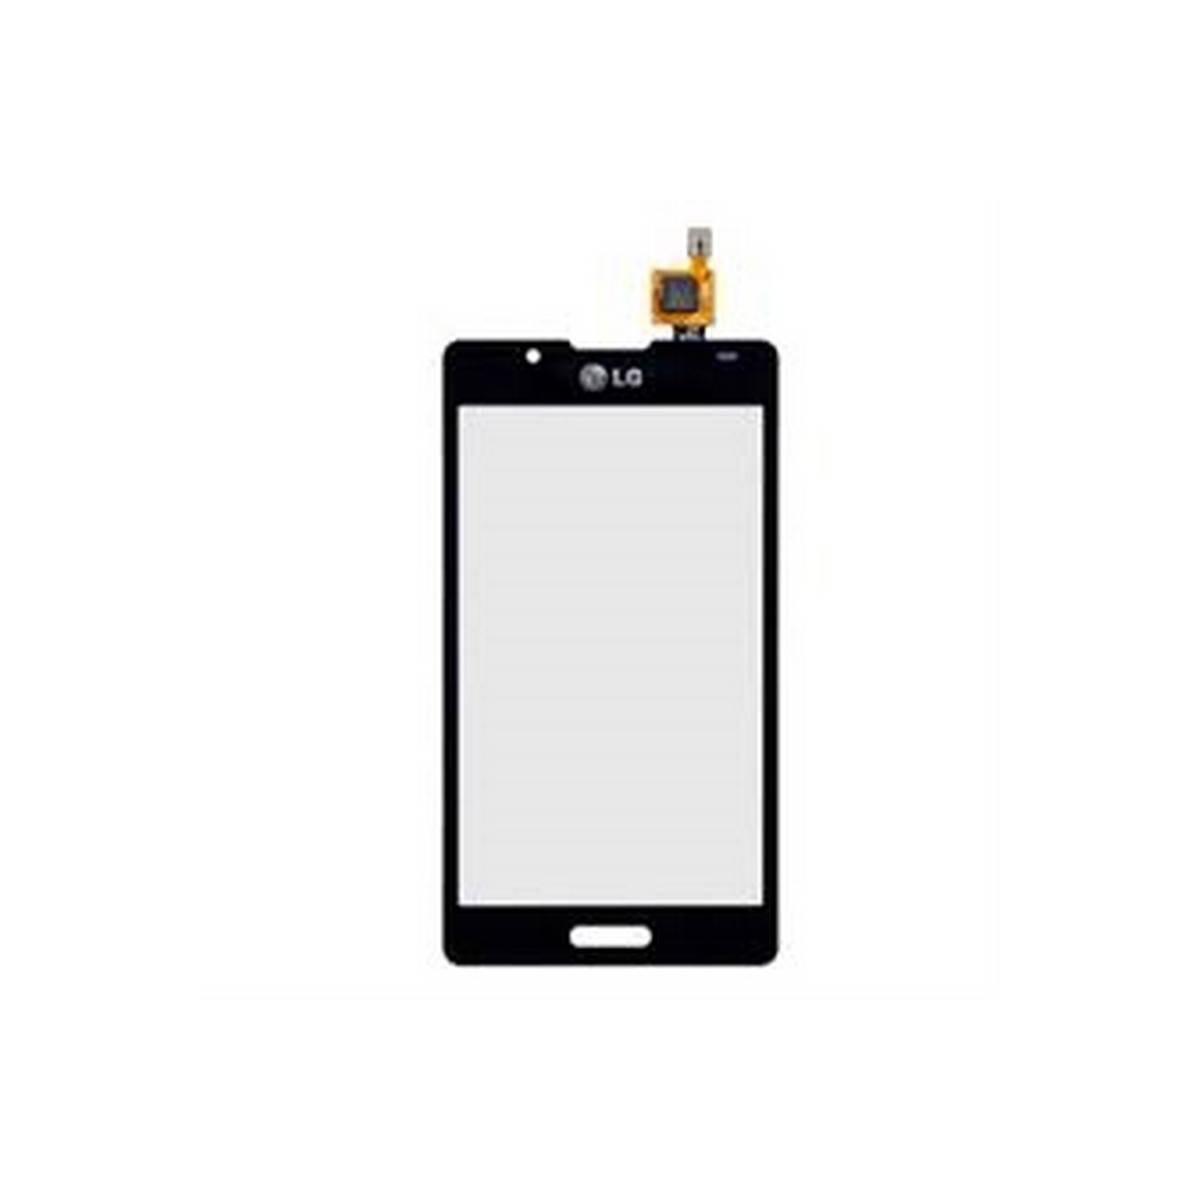 Pantalla táctil negra para LG Optimus L7 2, P710